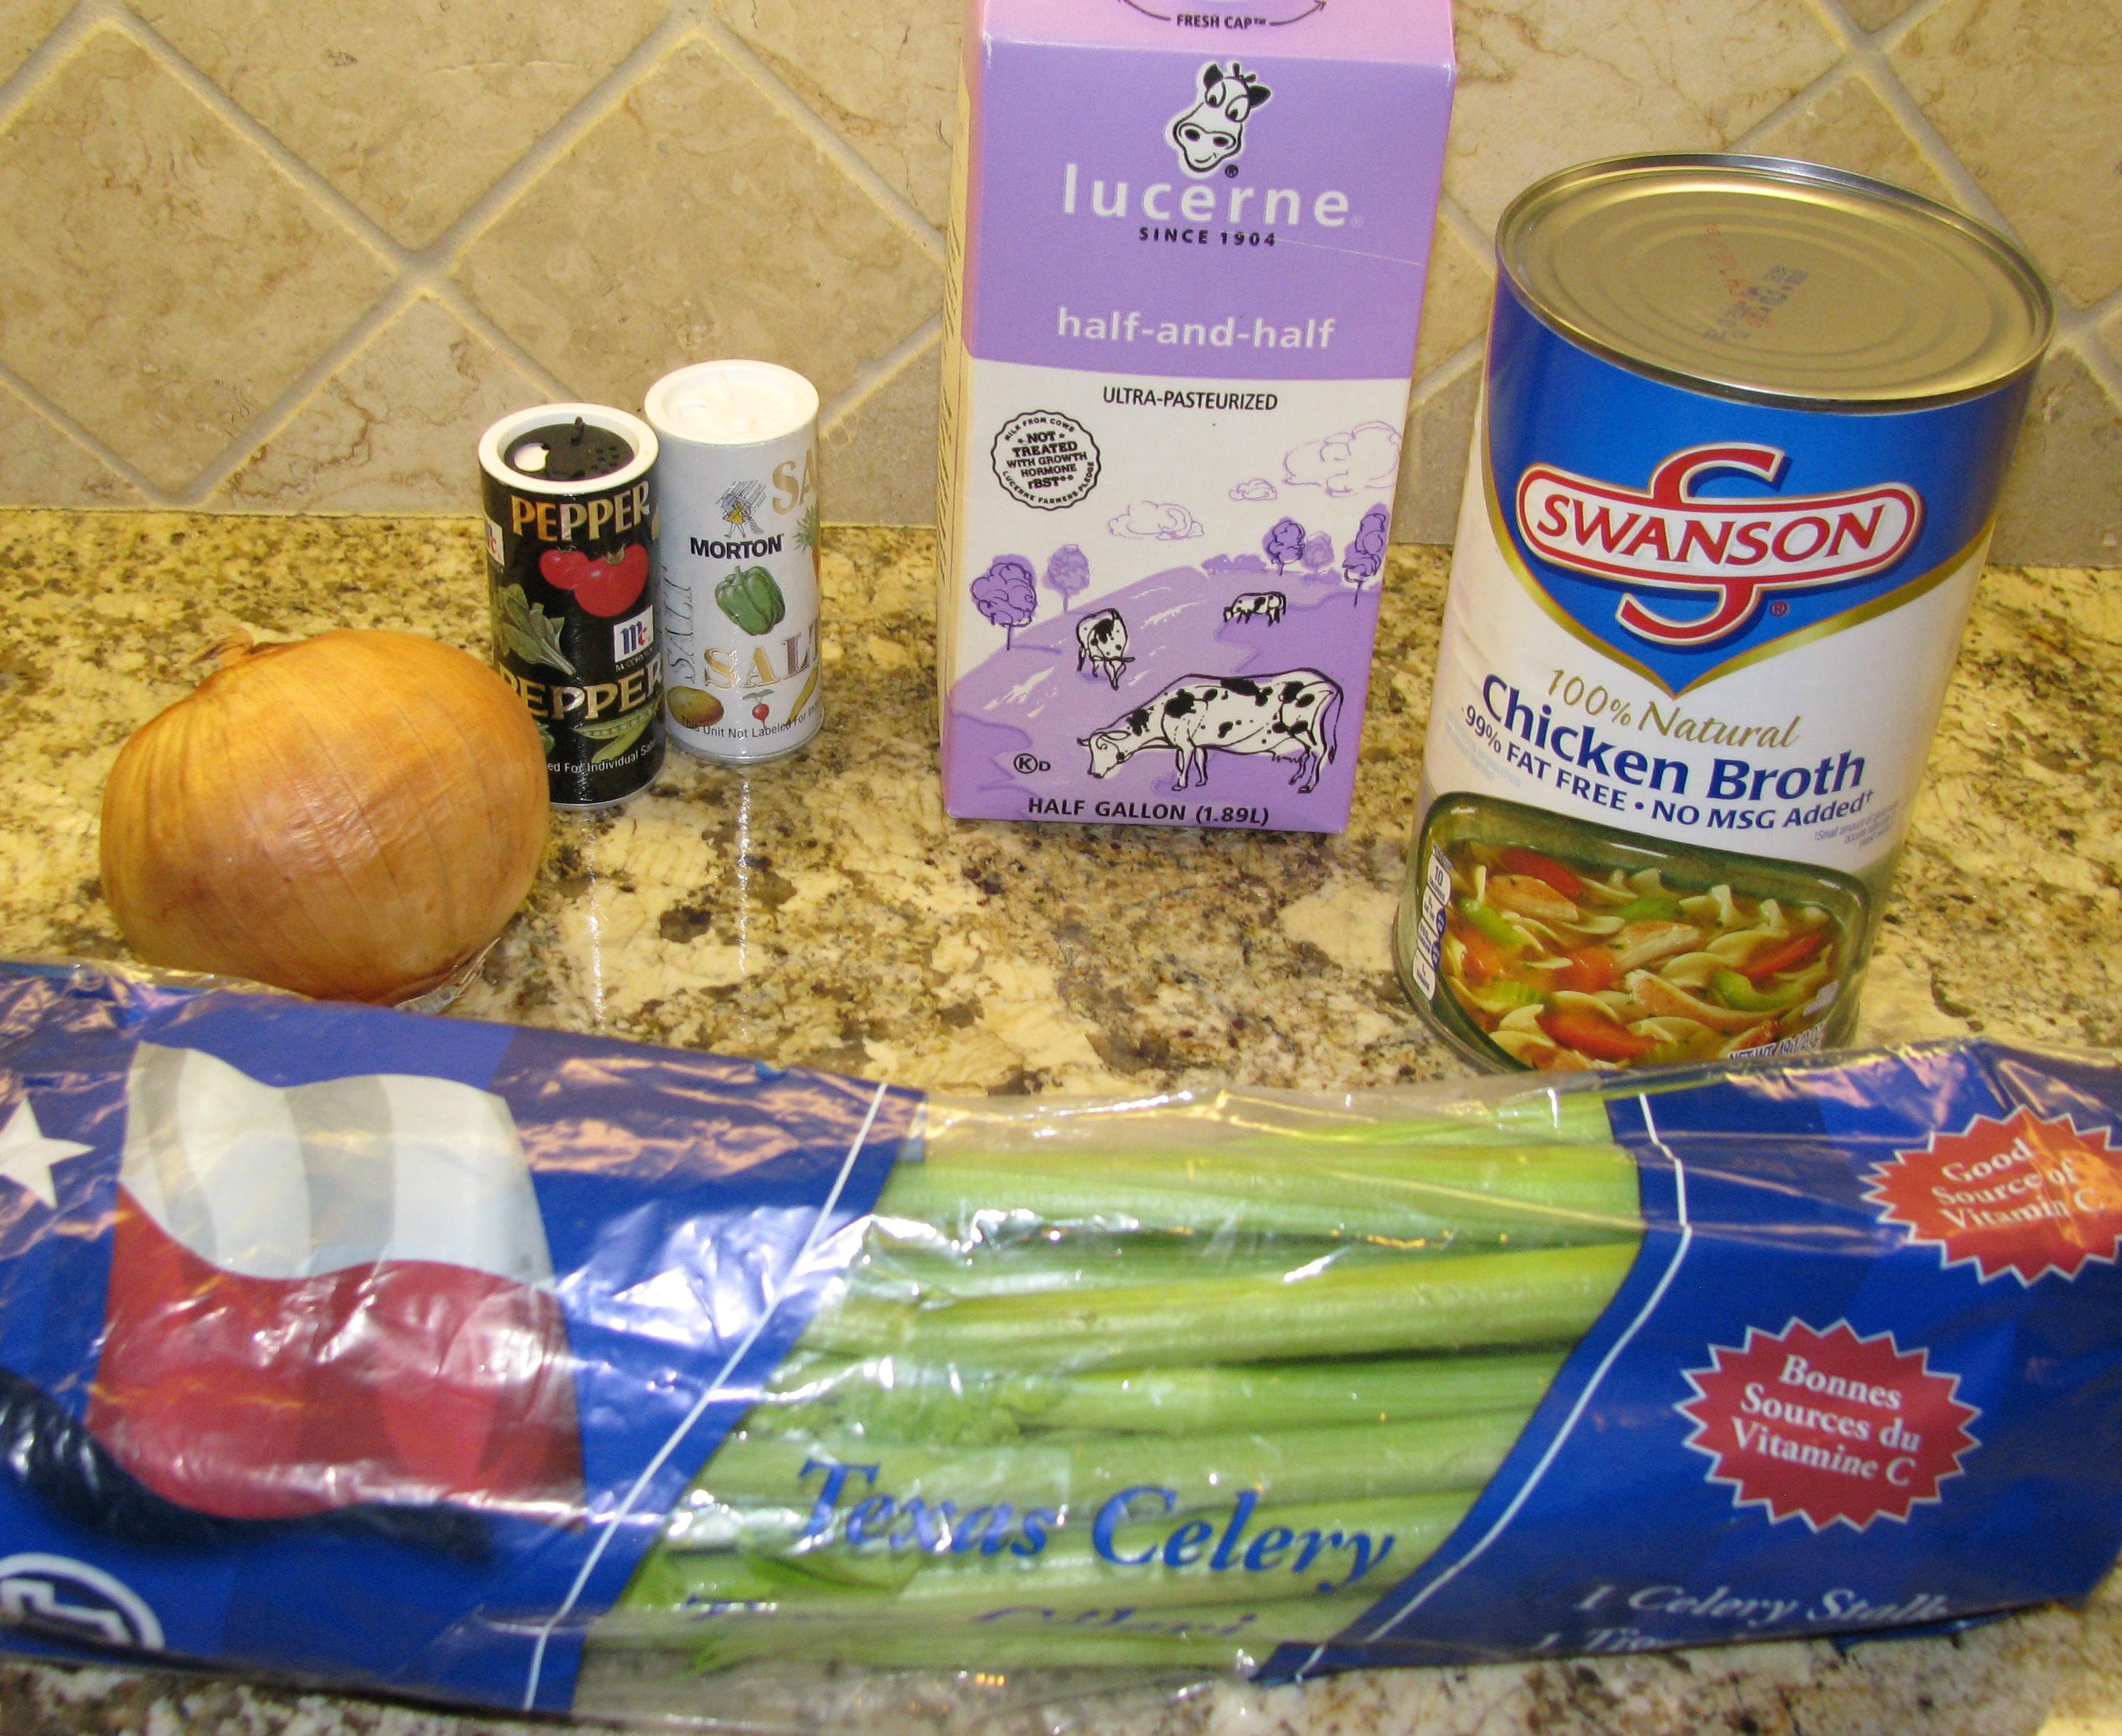 Celery soup ingredients